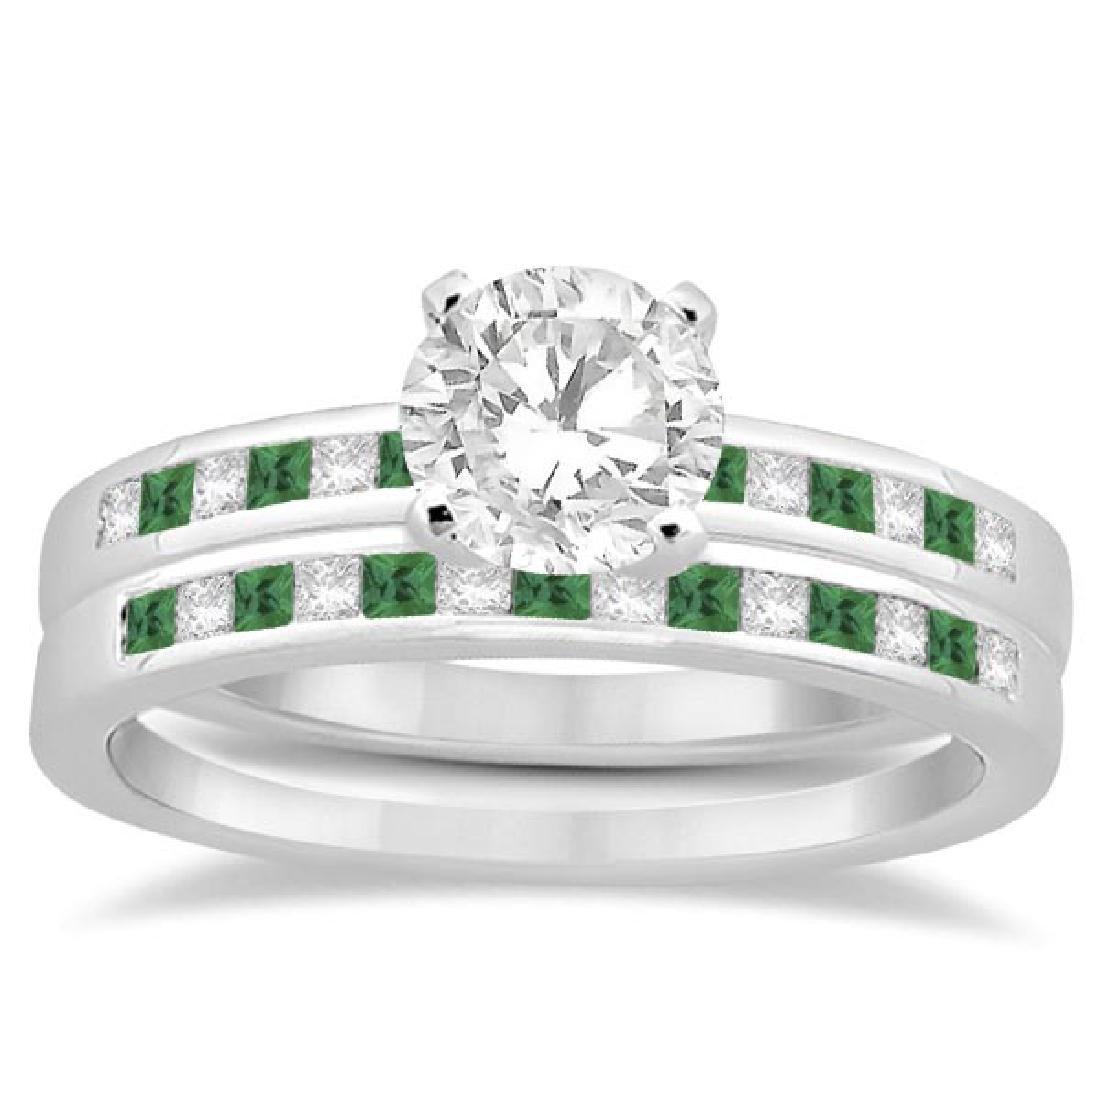 Princess Cut Diamond and Emerald Bridal Set 14k White